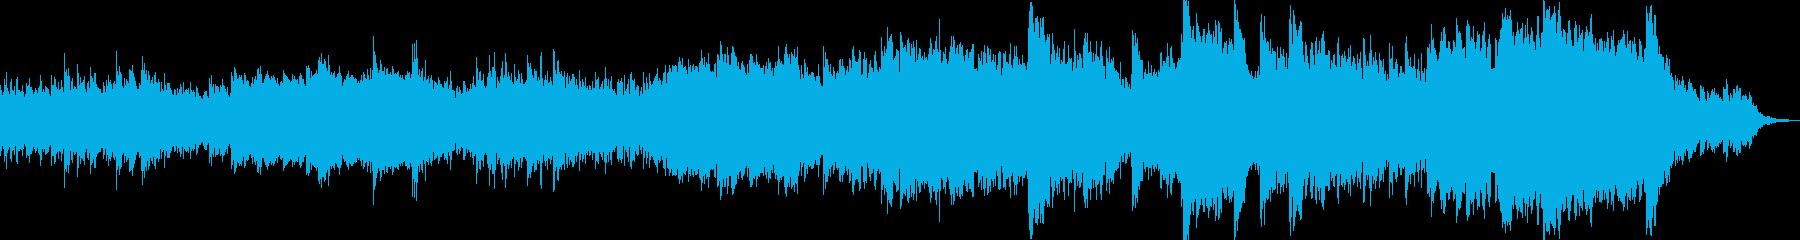 BGM 始まりの予感・薄明りの場面の再生済みの波形